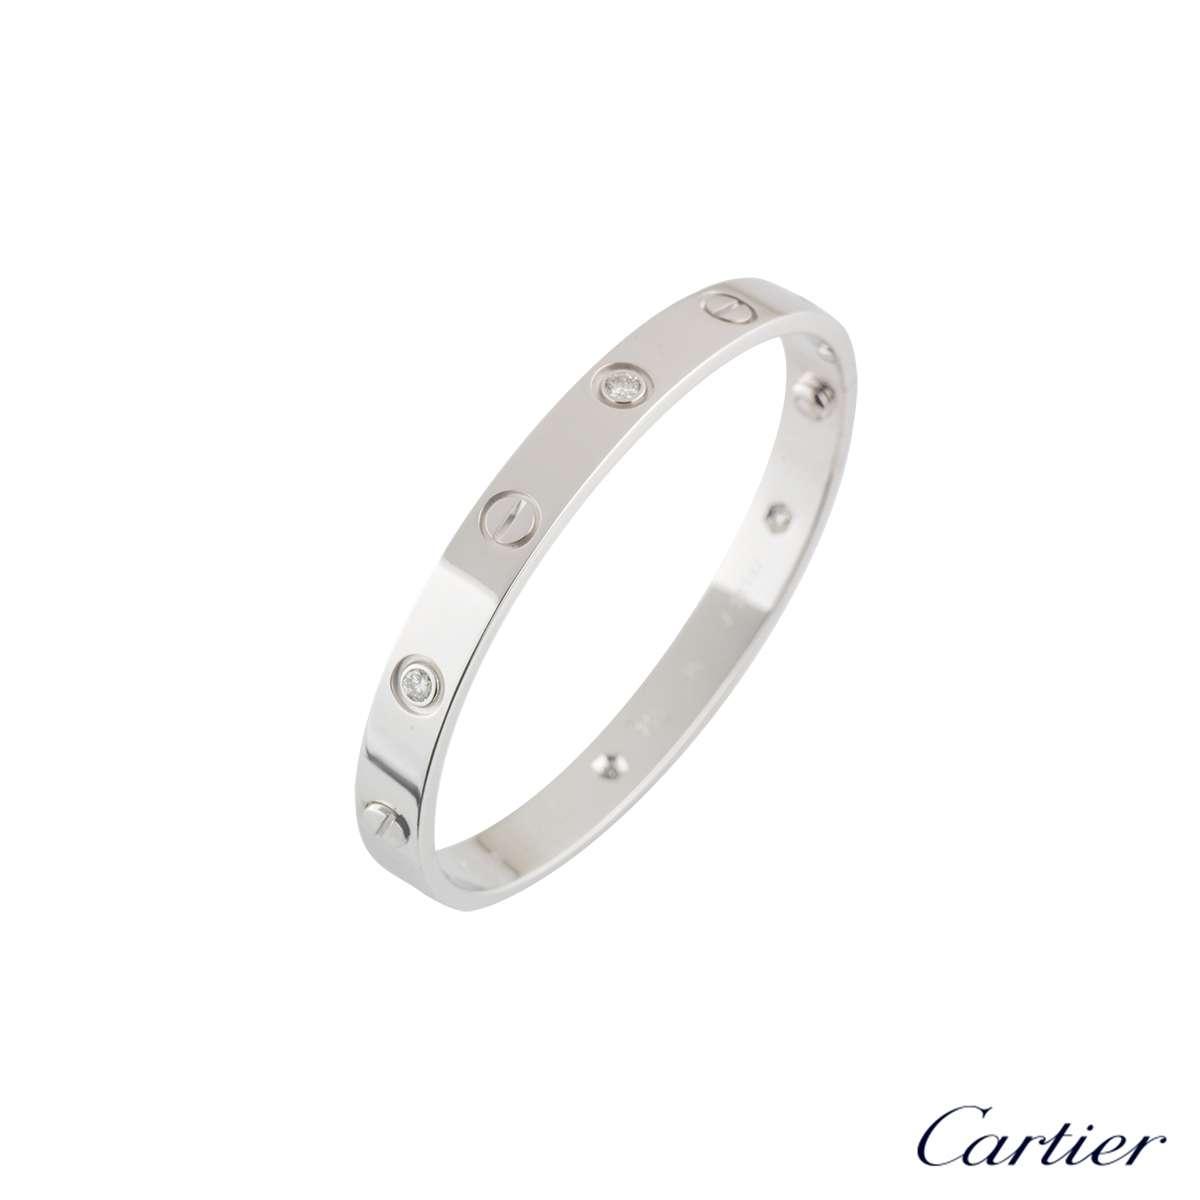 CartierWhite Gold Half Diamond Love Bracelet Size 17B6014017